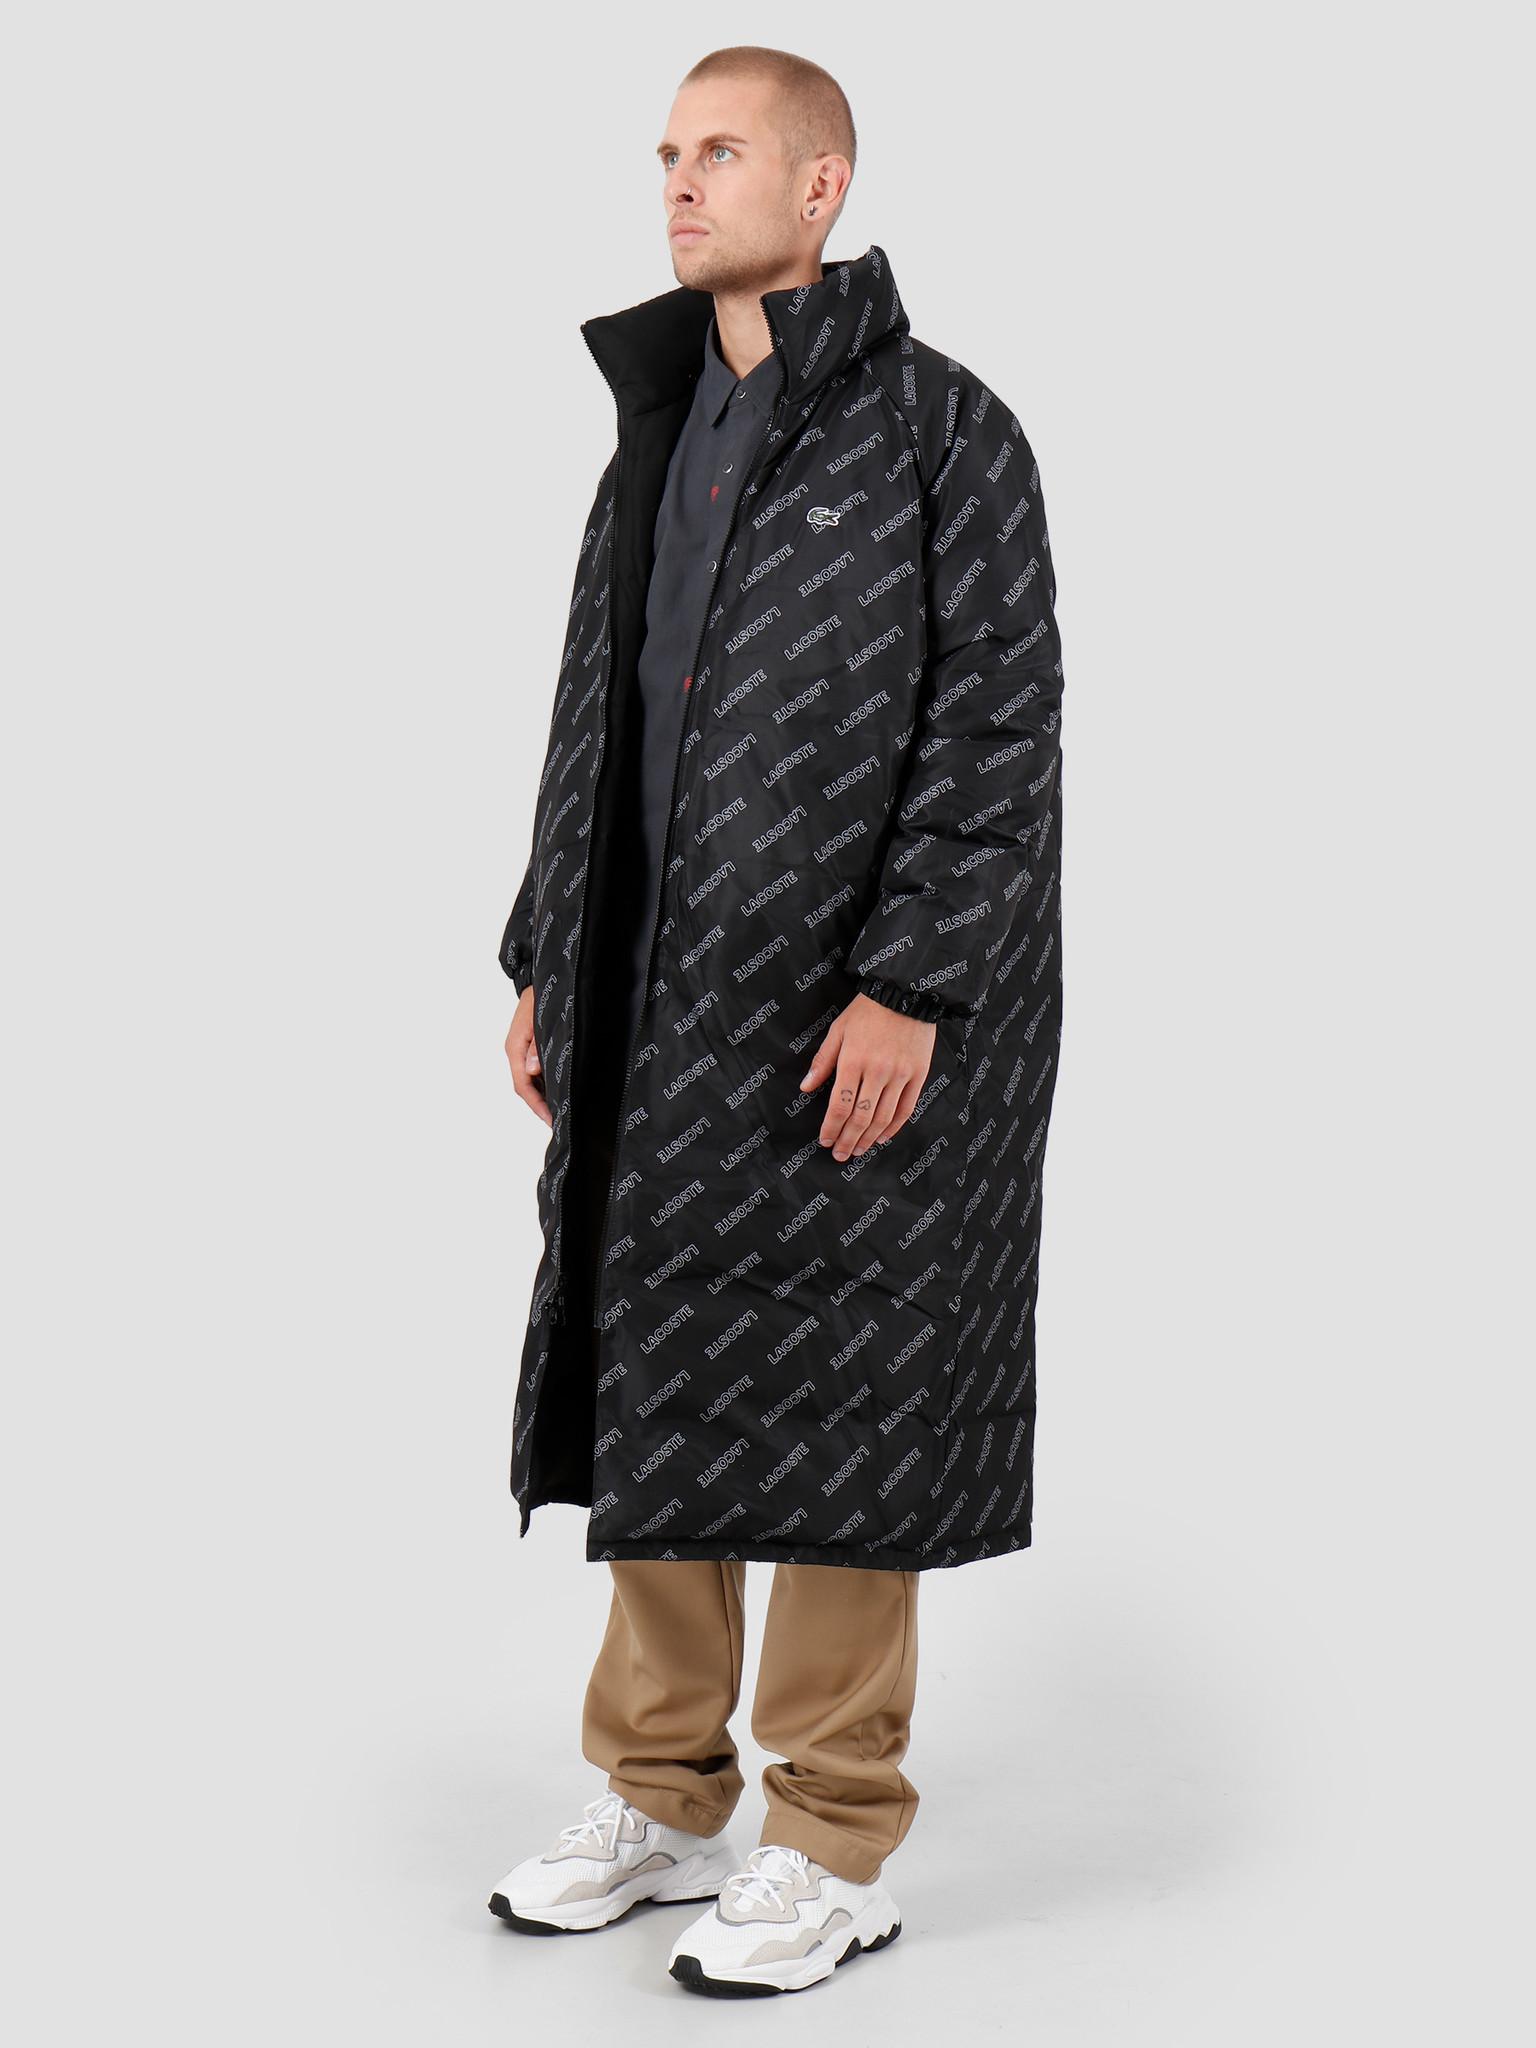 Lacoste Lacoste 1HB1 Jacket Black Black-White BH8008-93